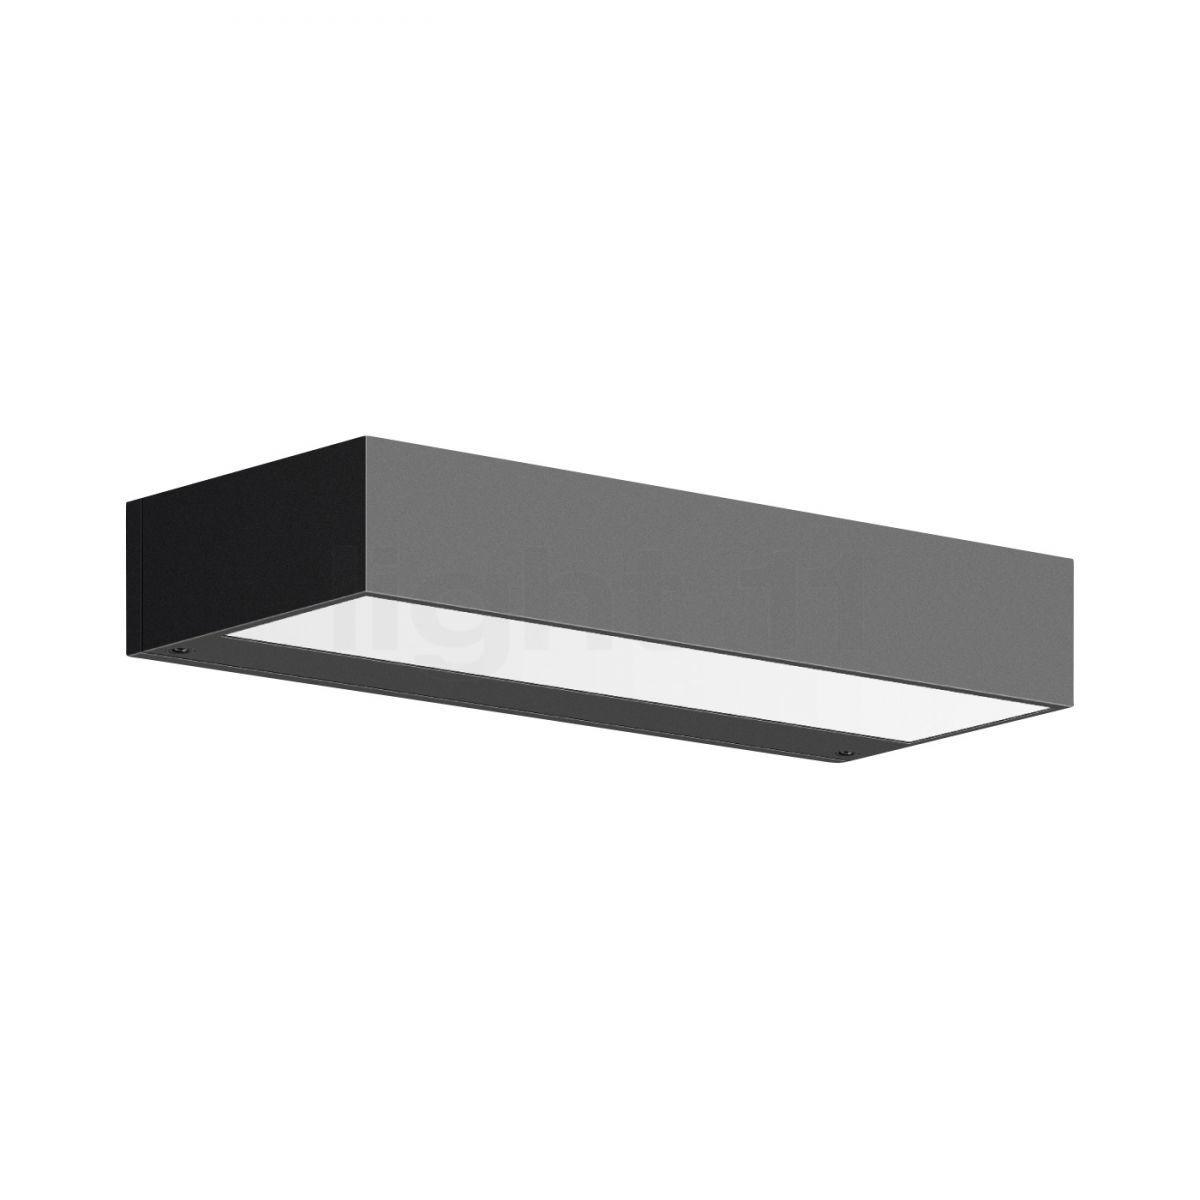 bega leuchten lampen kaufen bei. Black Bedroom Furniture Sets. Home Design Ideas